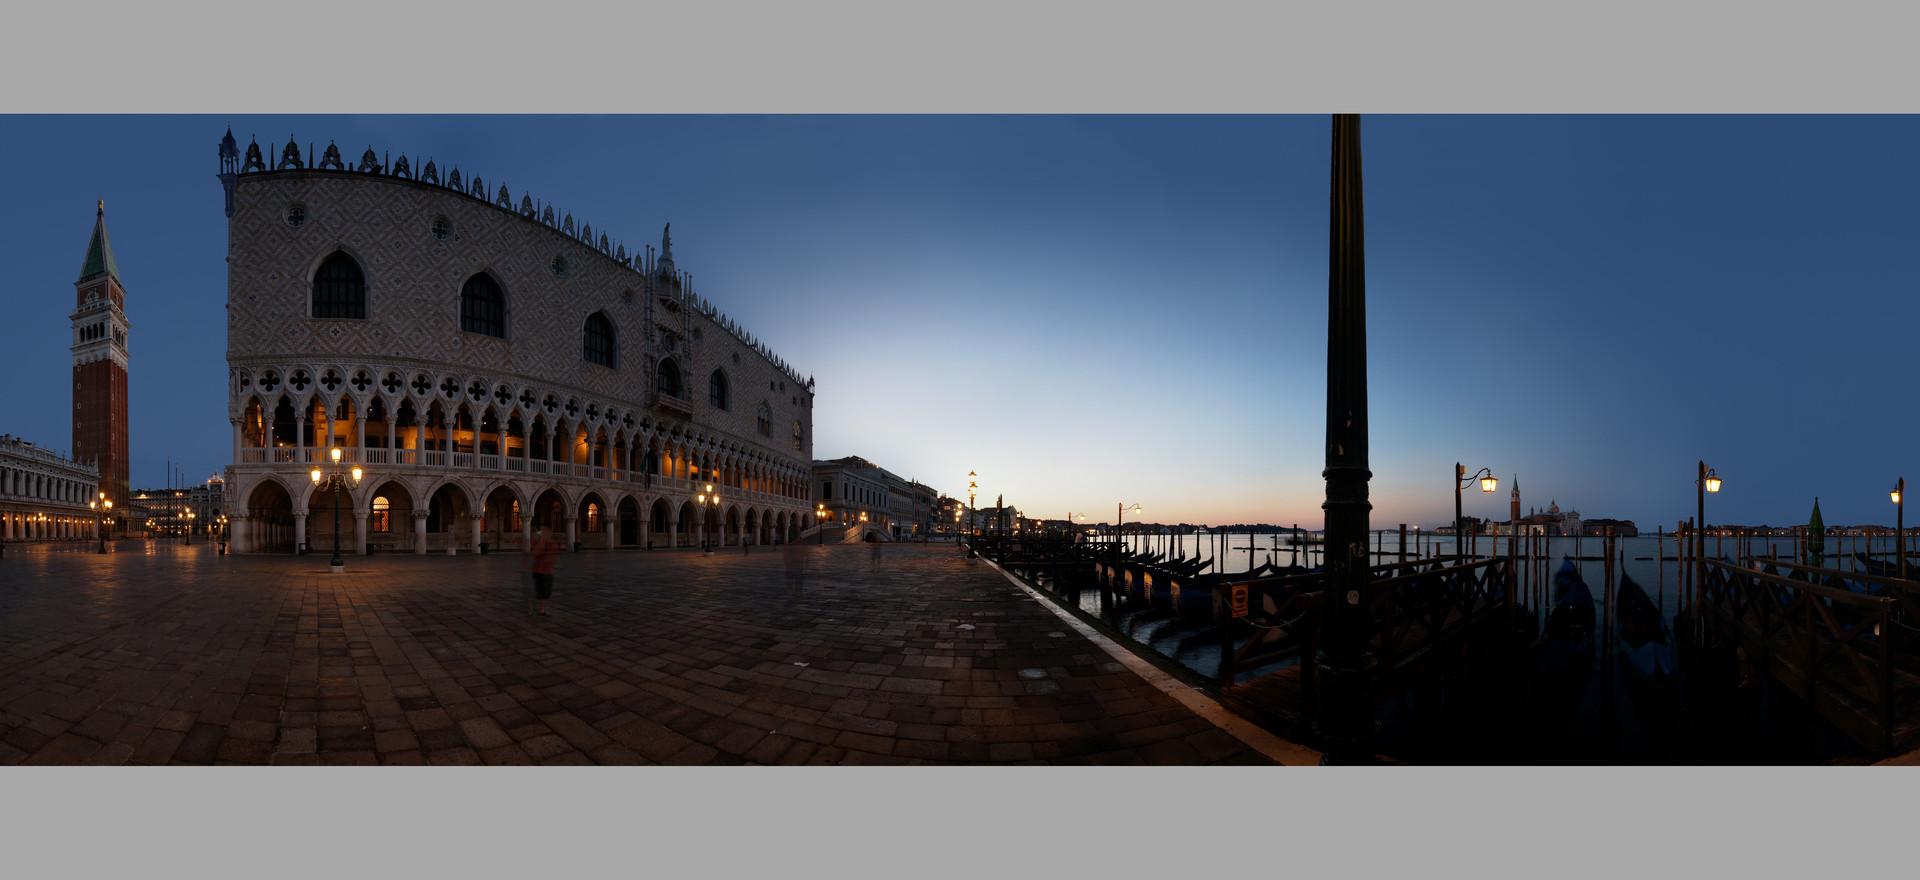 Sunrise in San Marco, Venice, Italy